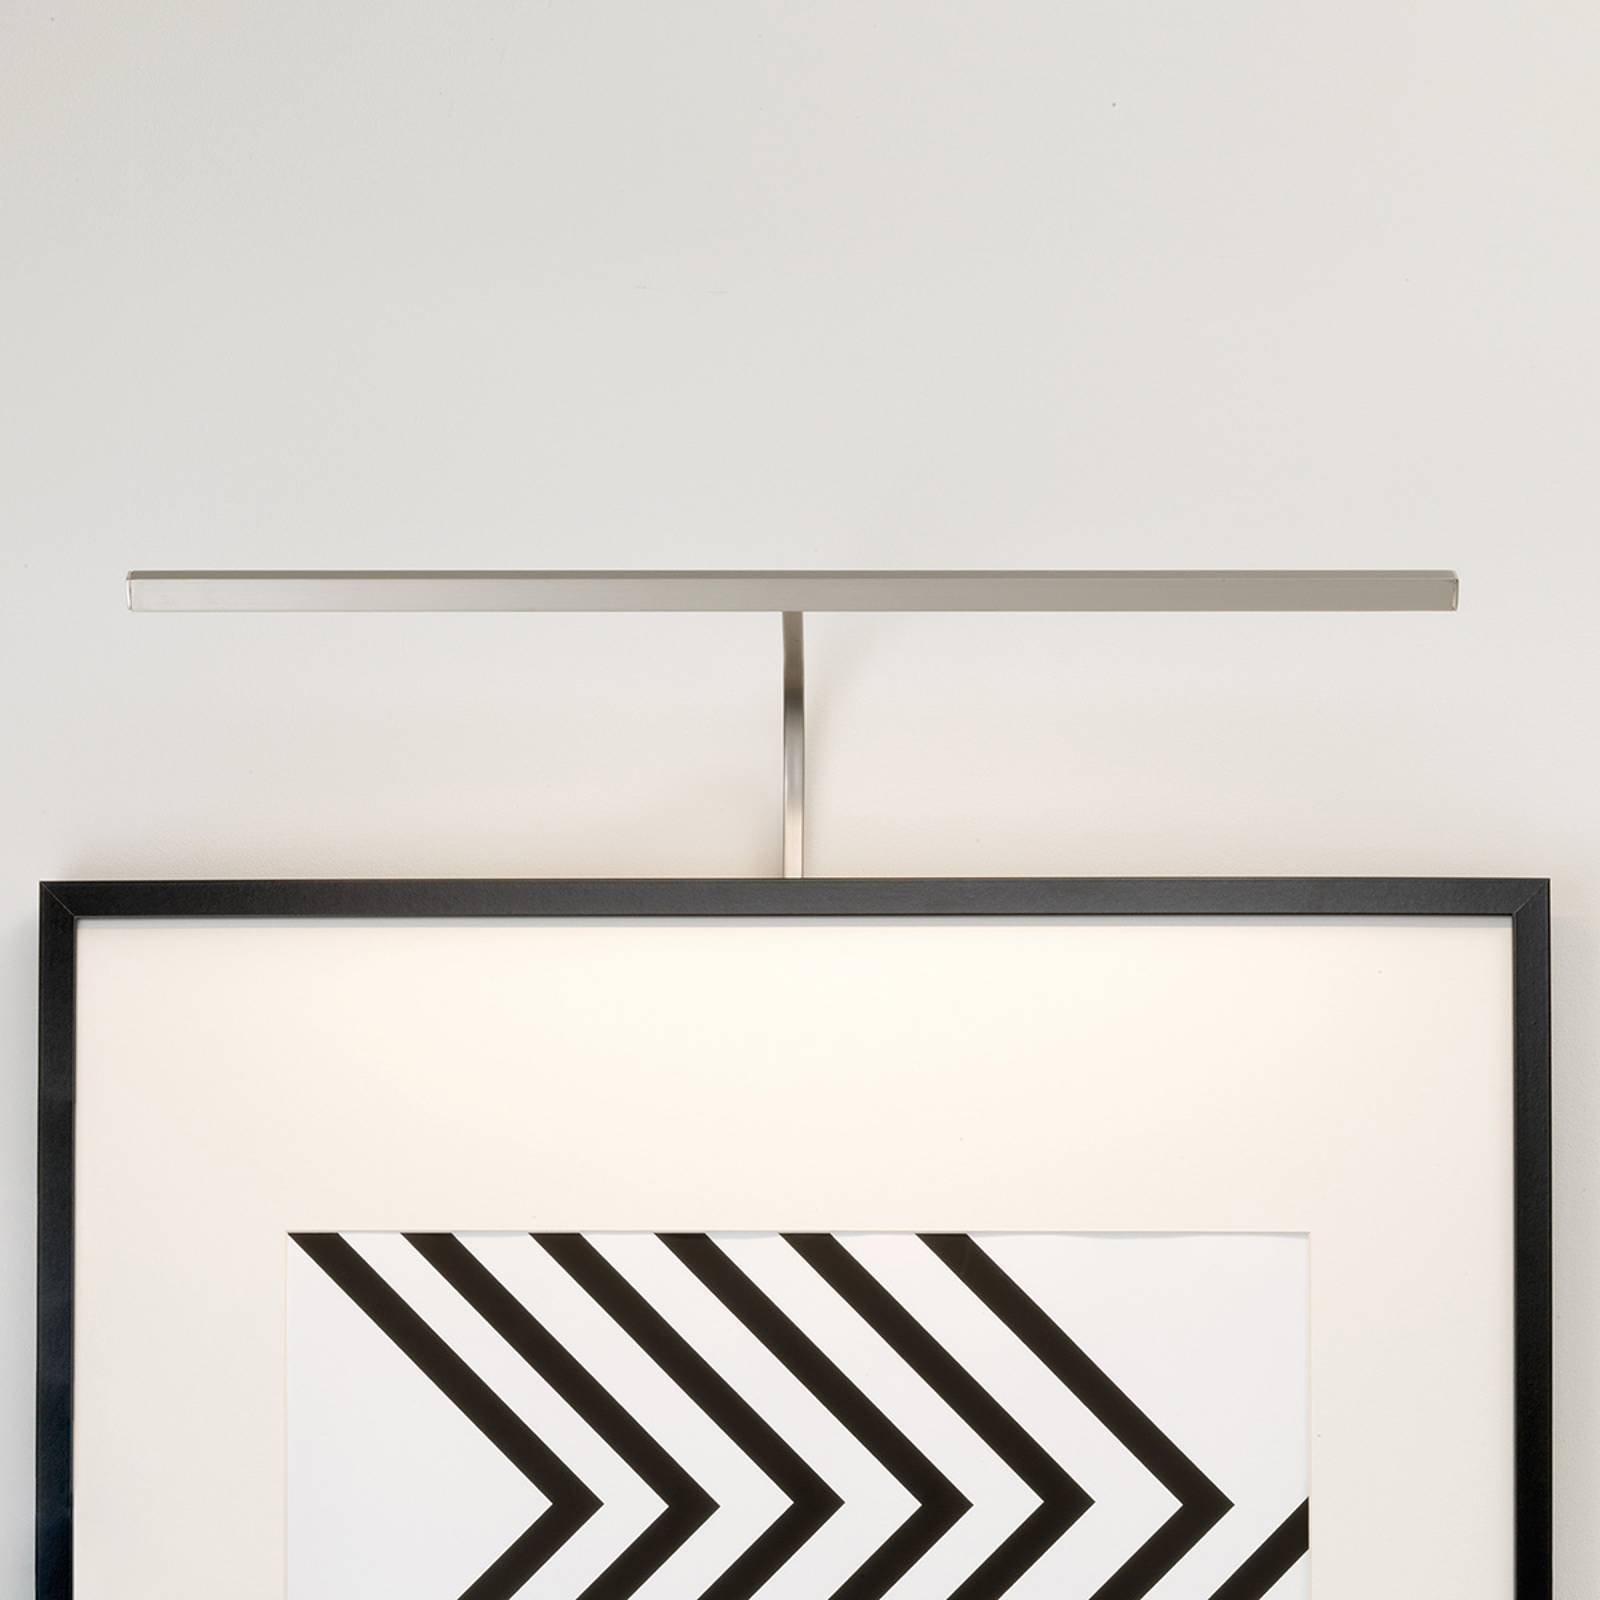 Astro Mondrian rammemont. vegglampe, nikkel 60 cm